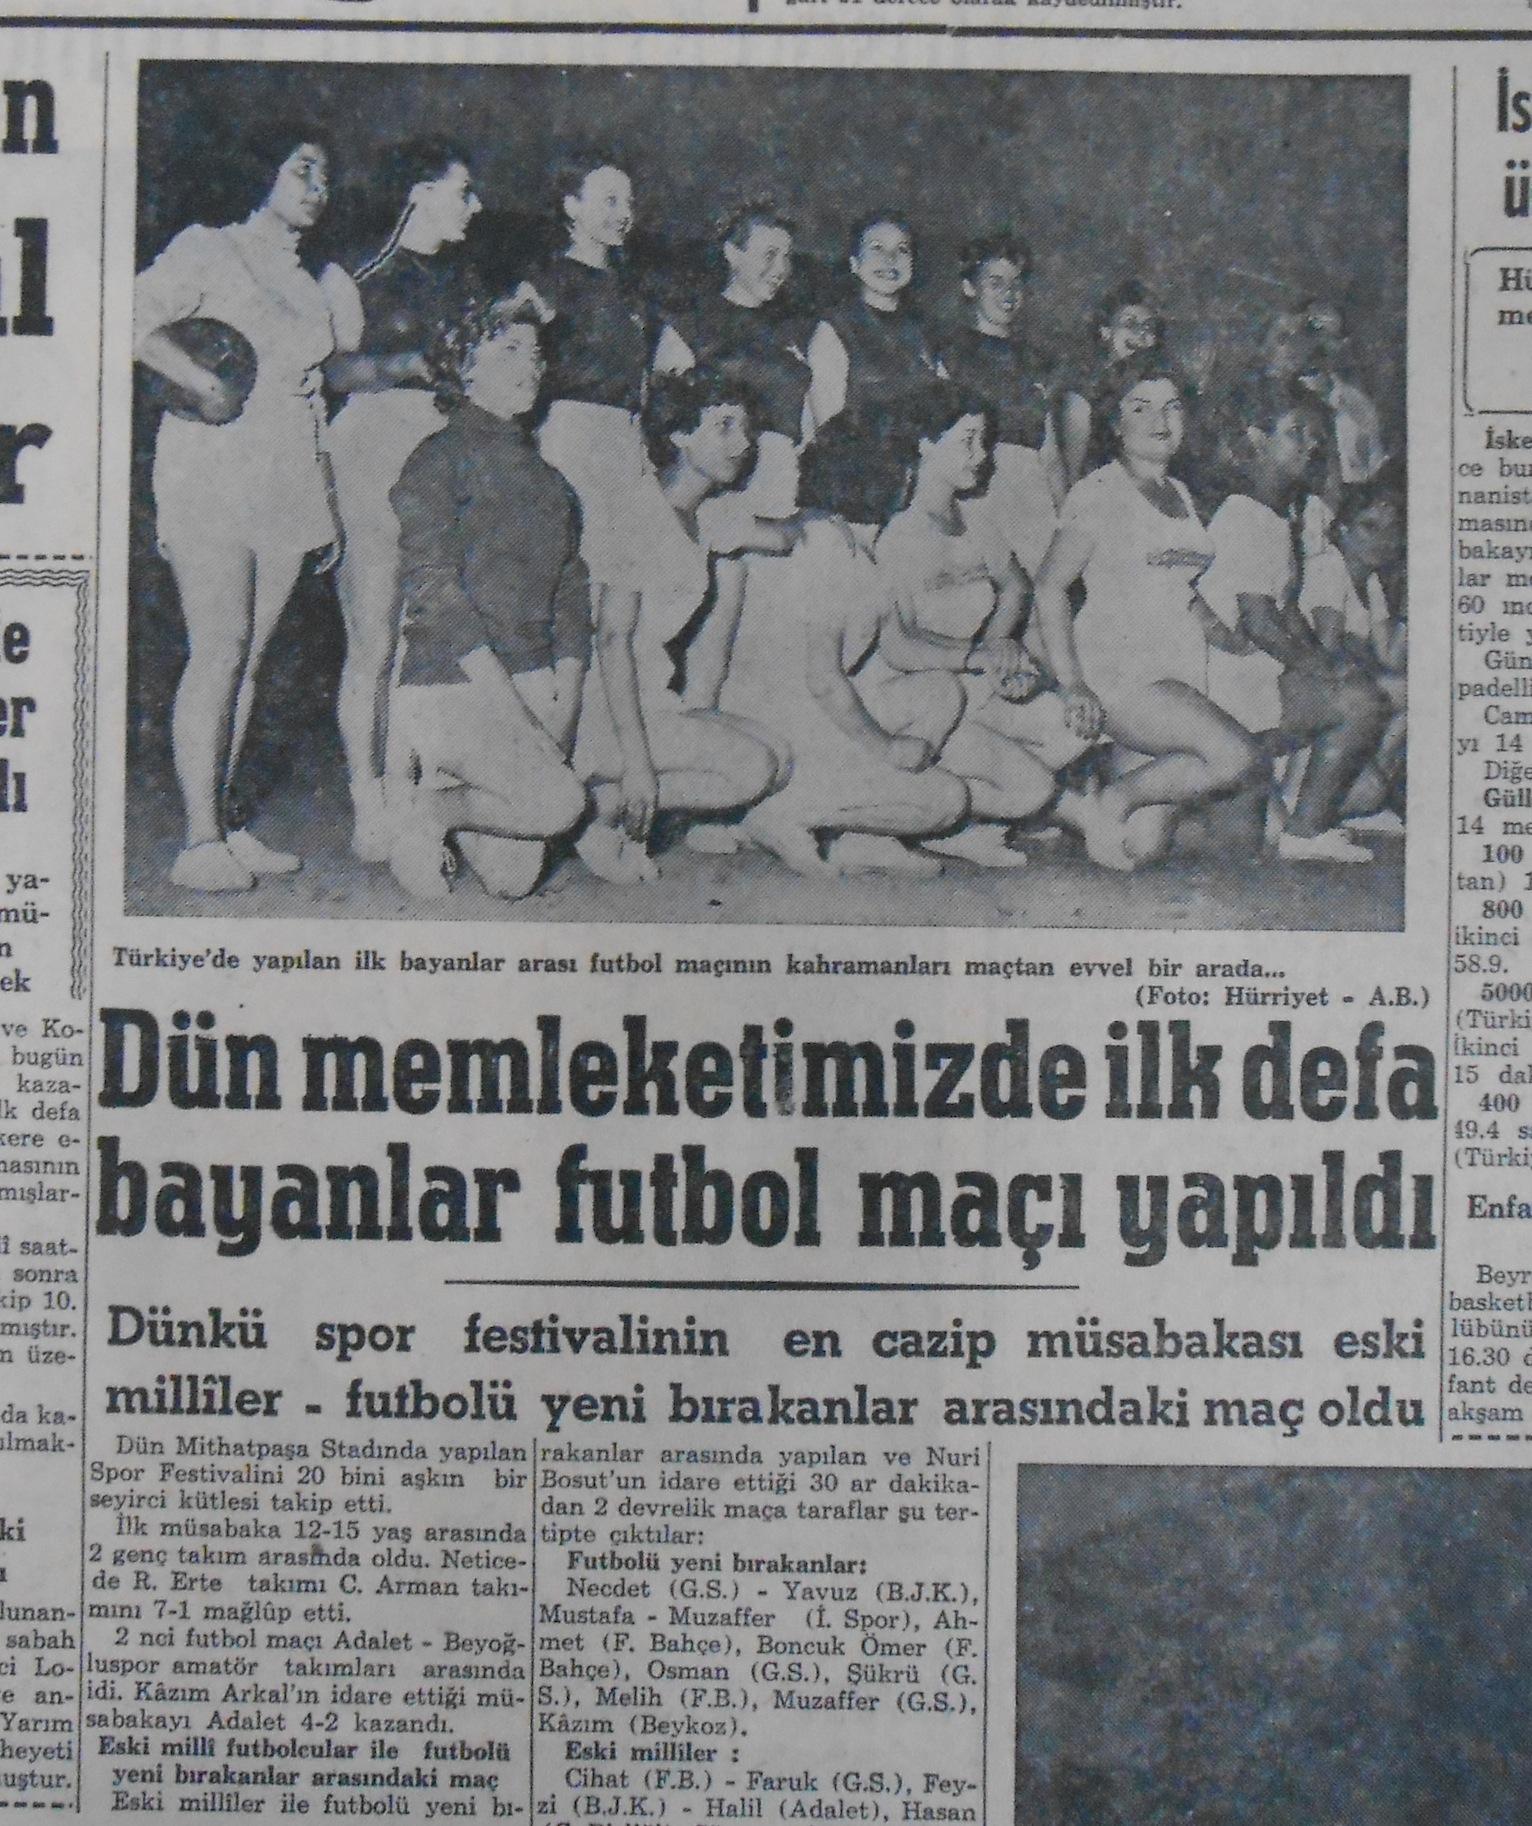 5 Temmuz 1954 Hürriyet